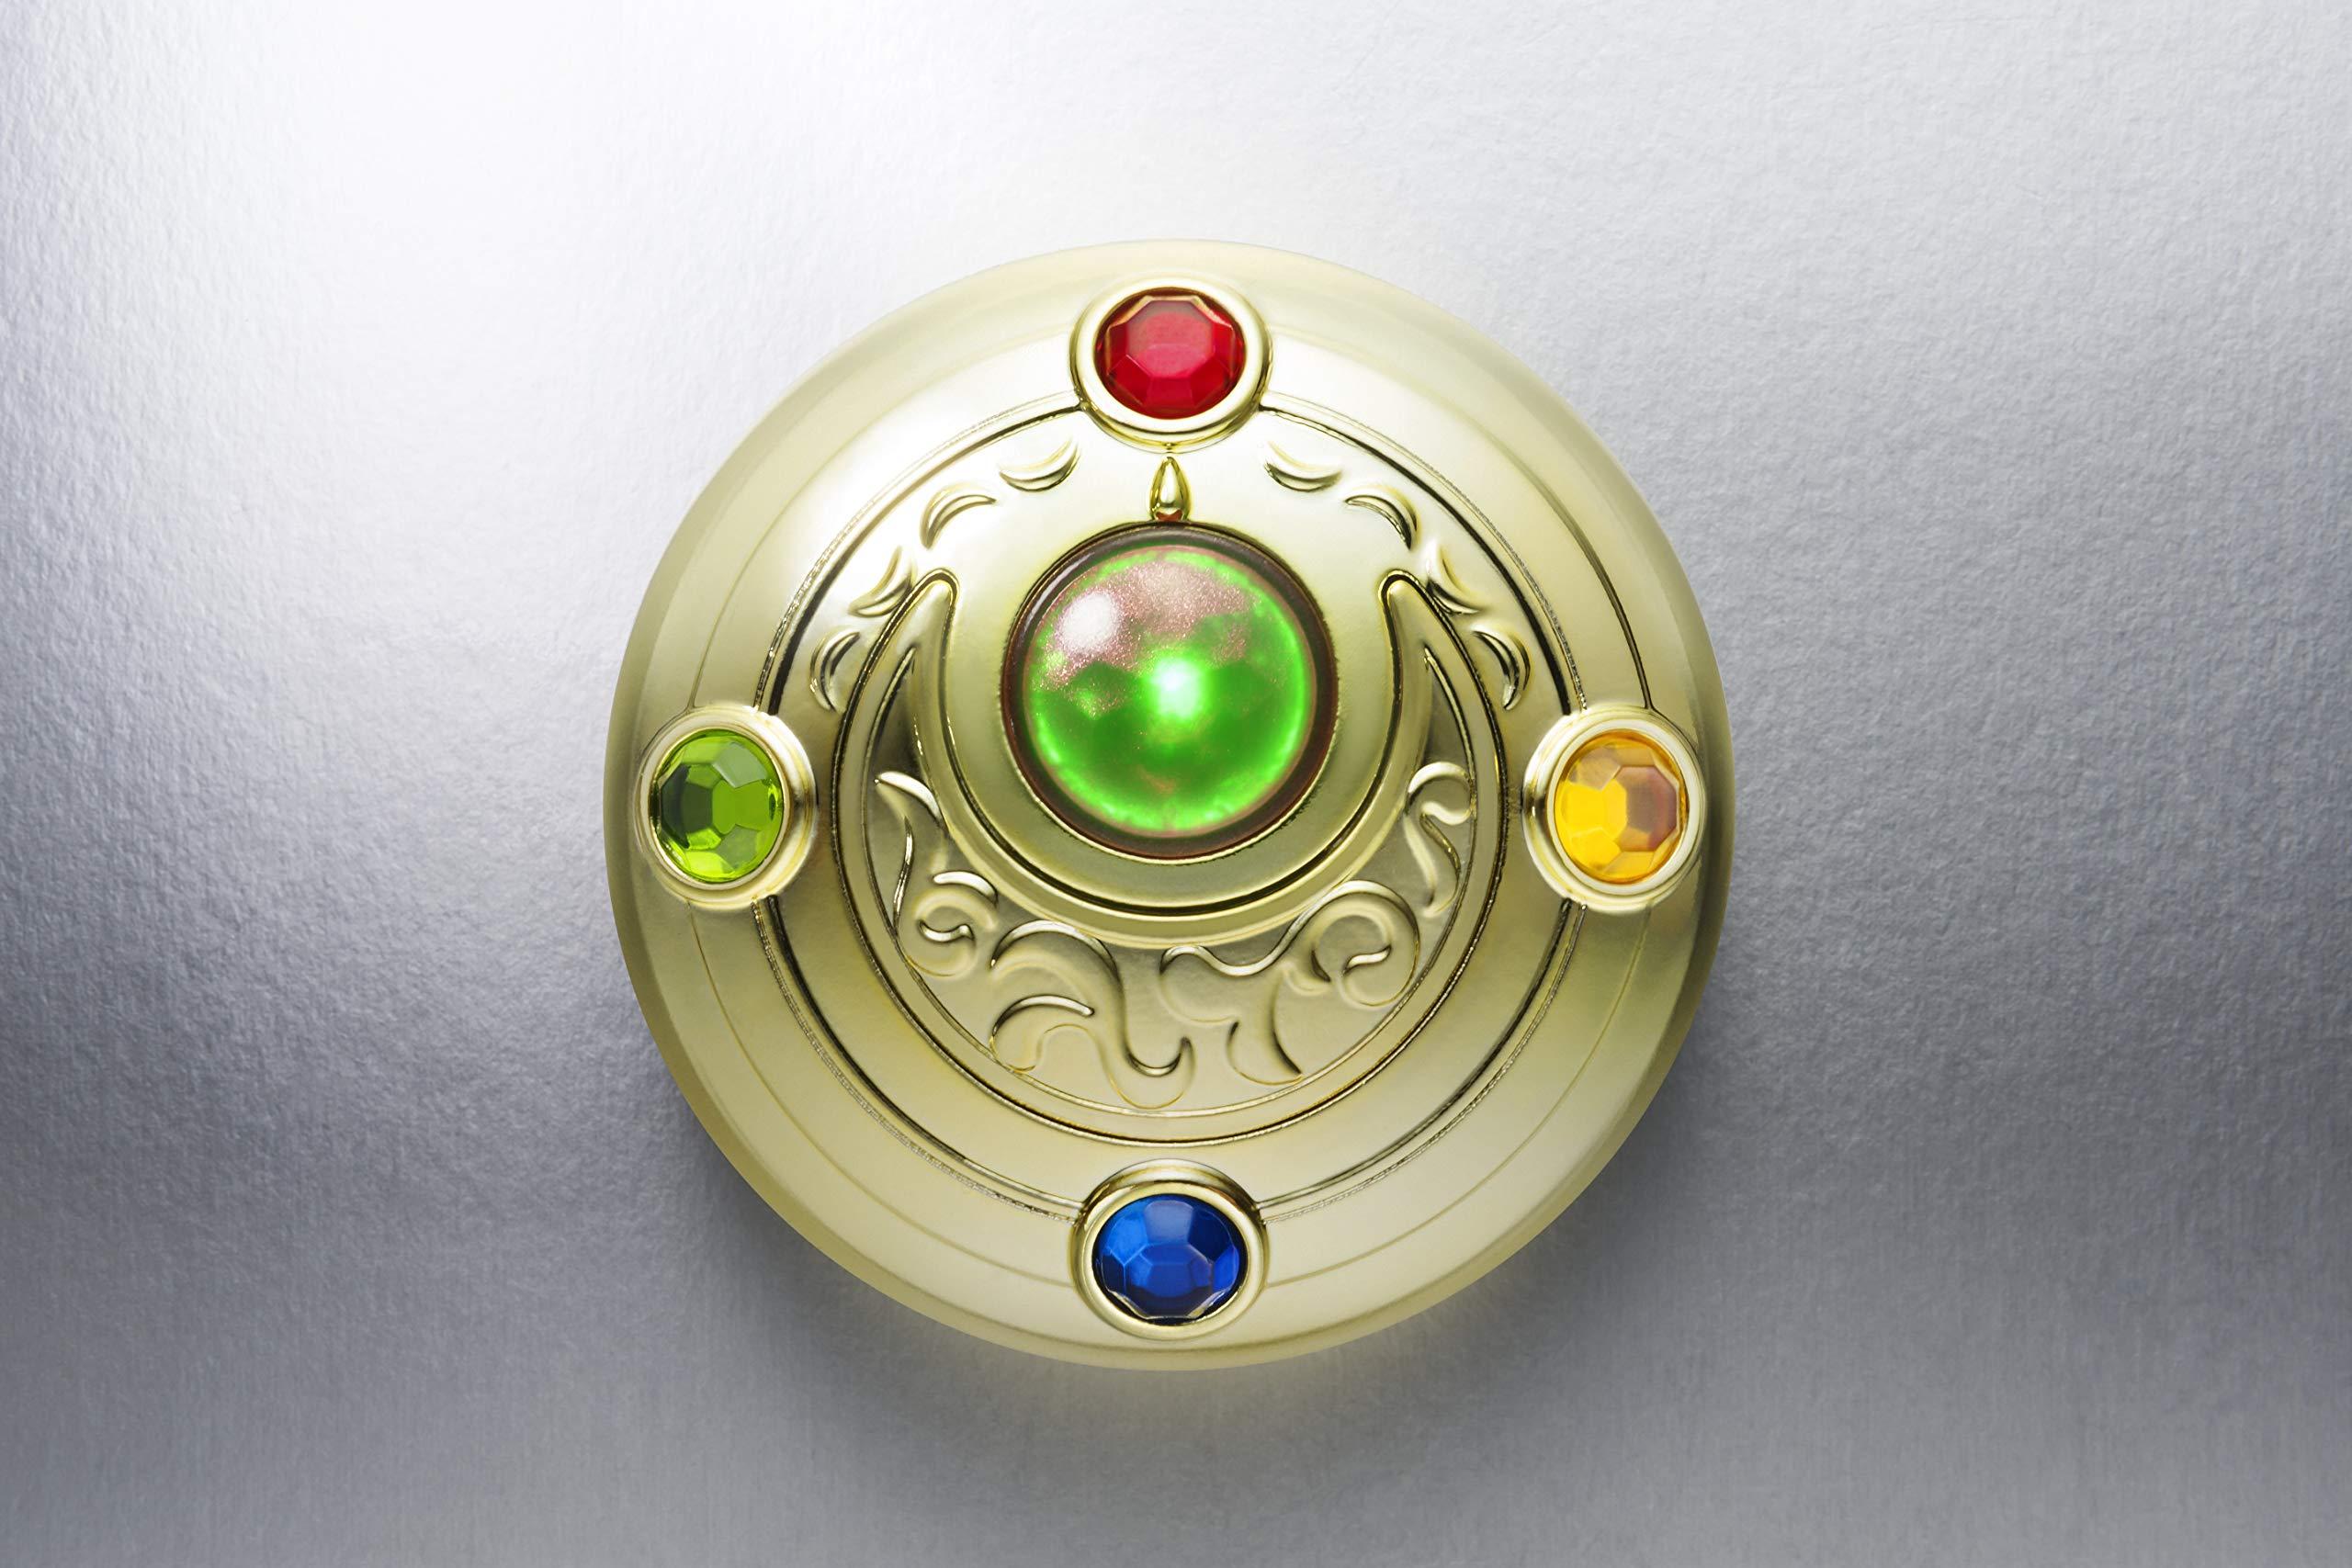 Bandai Tamashii Nations Proplica Transformation Brooch & Disguise Pen Set ''Sailor Moon'' Statue by Tamashii Nations (Image #12)